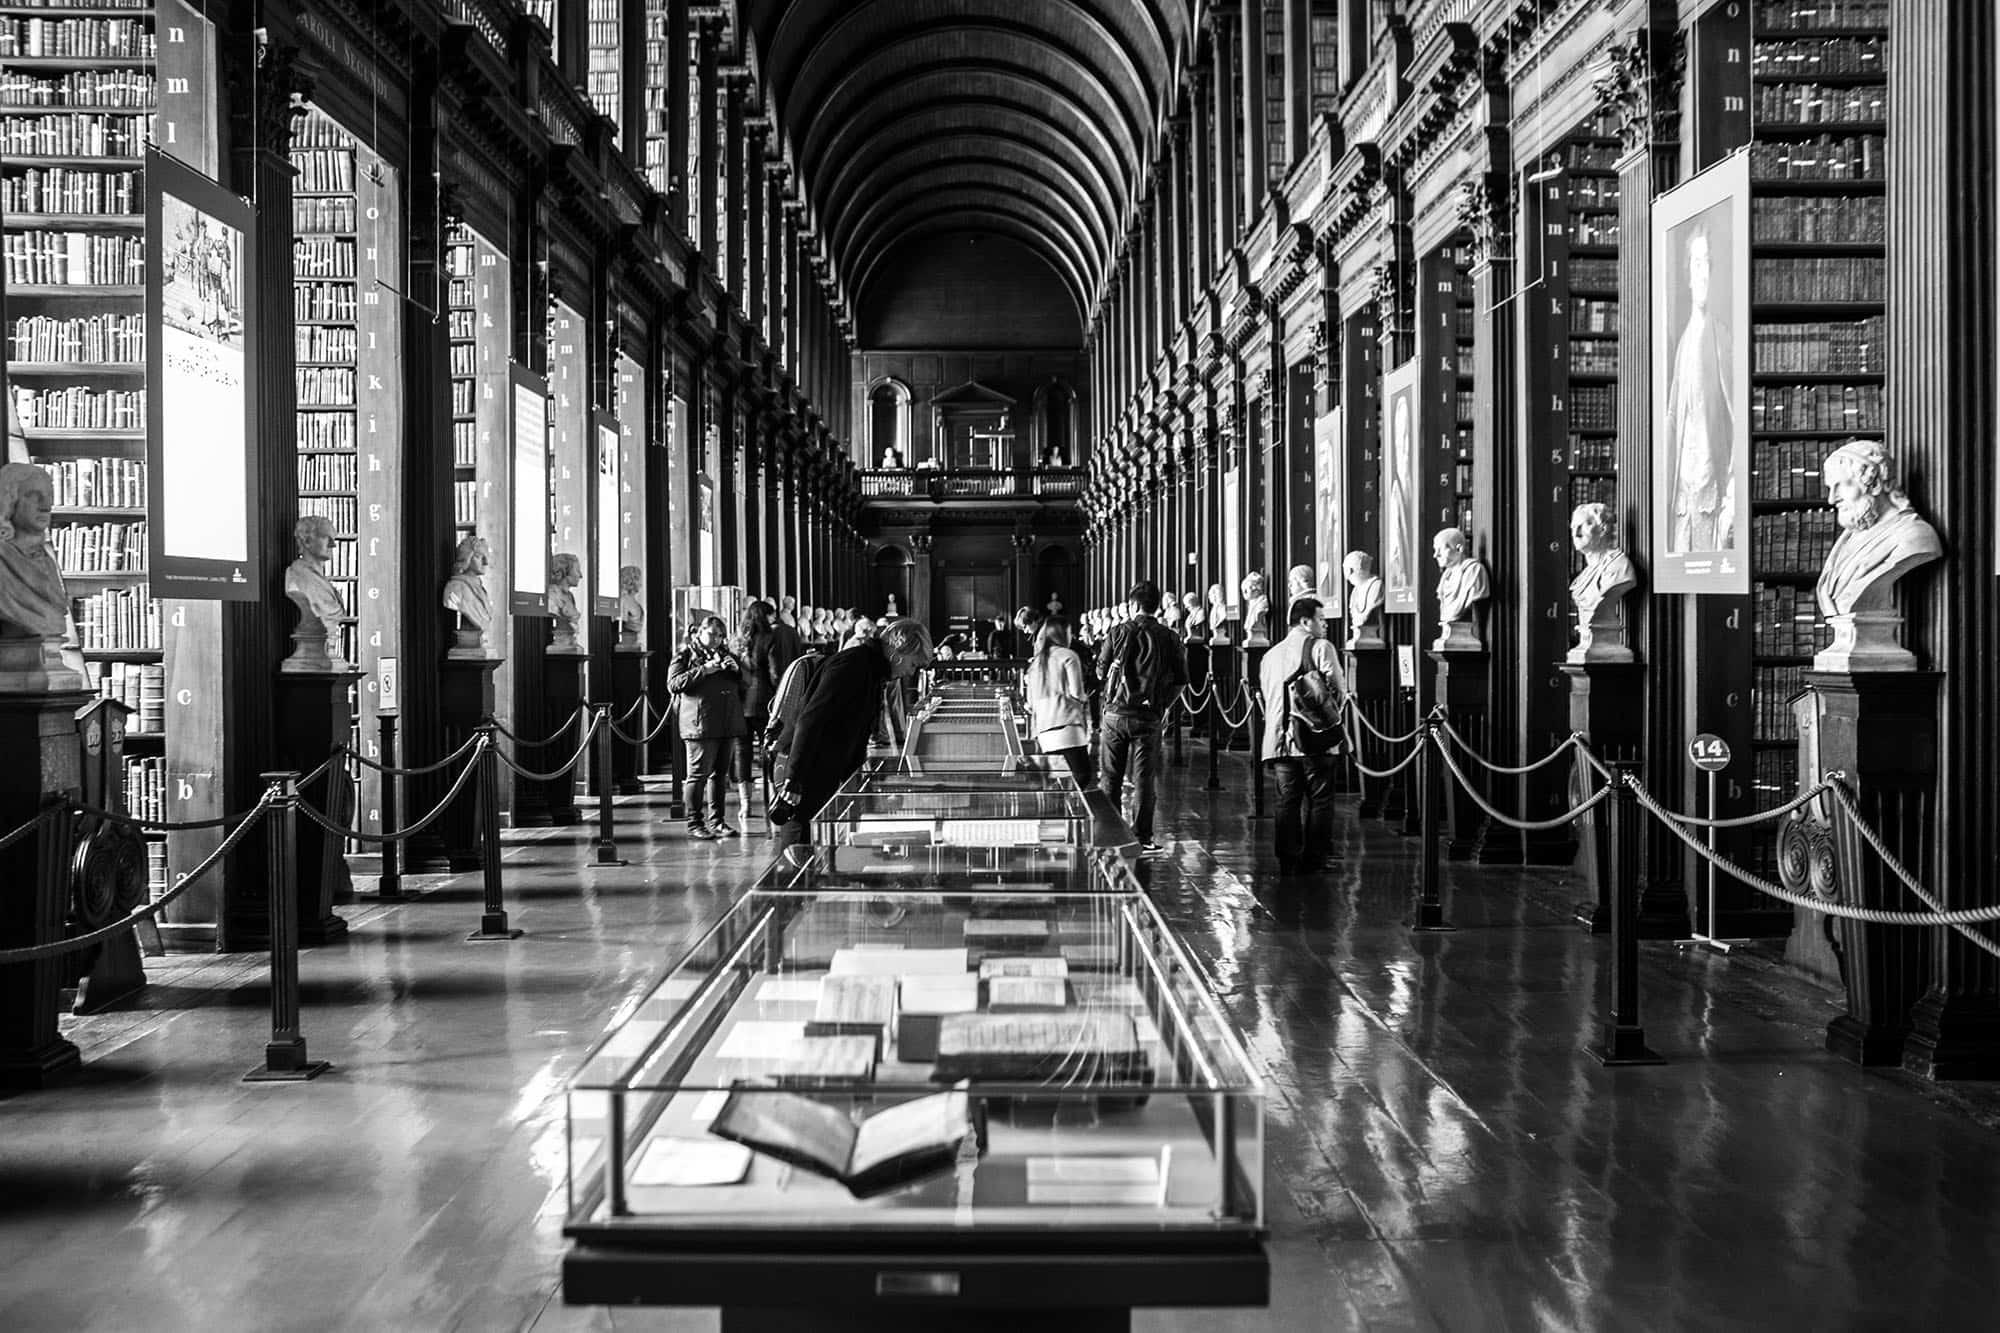 The Long Room - Dublin, Ireland